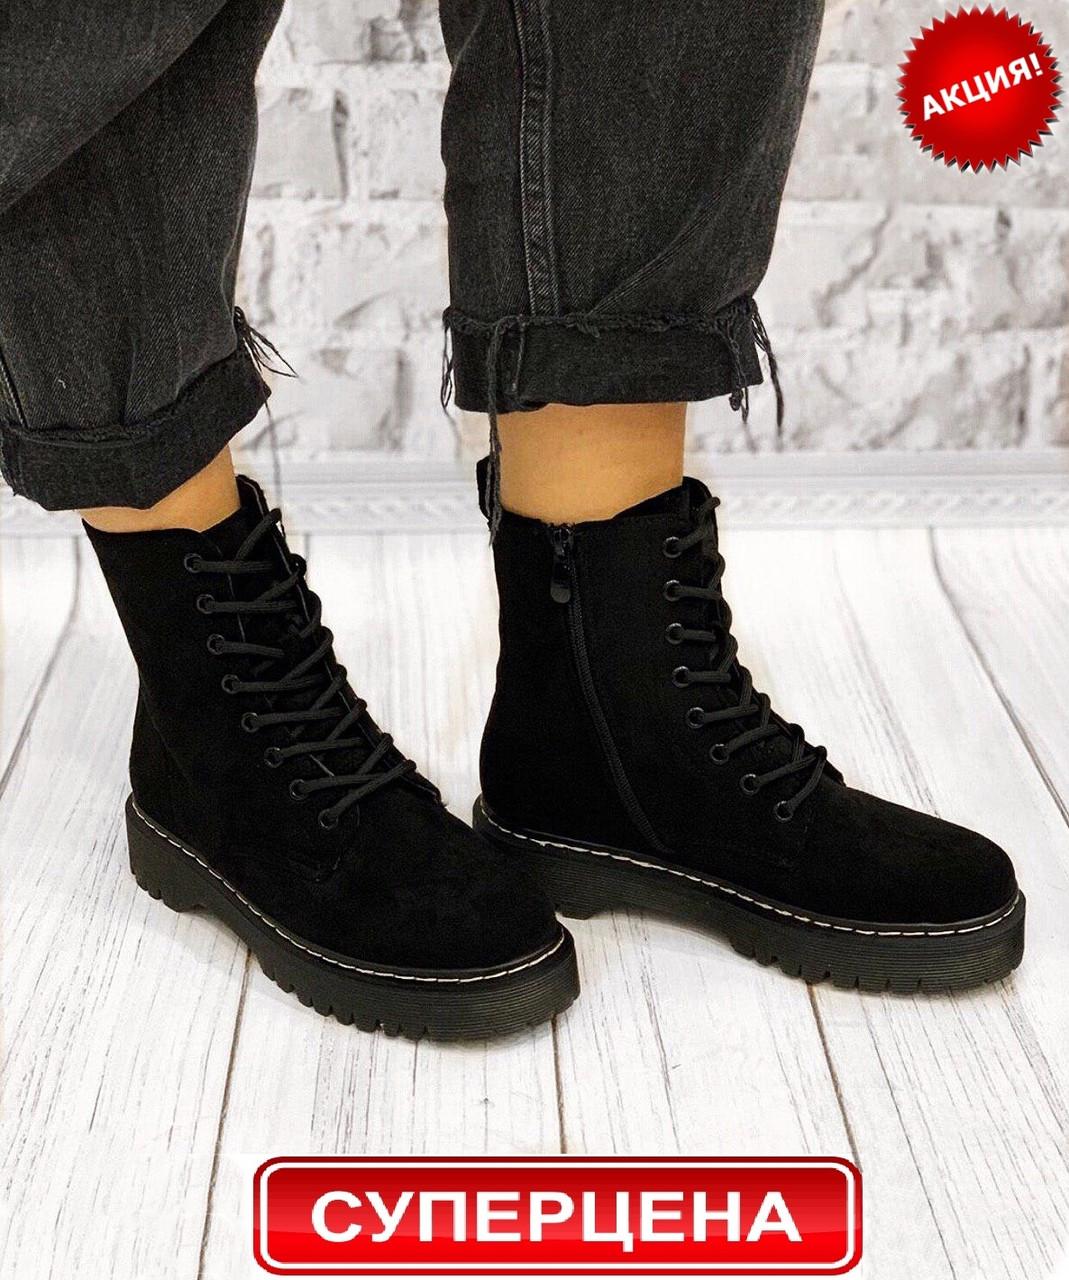 Женские Ботинки Dr.Martens  -Ботинки женские черные демисезонные Ботинки Martin